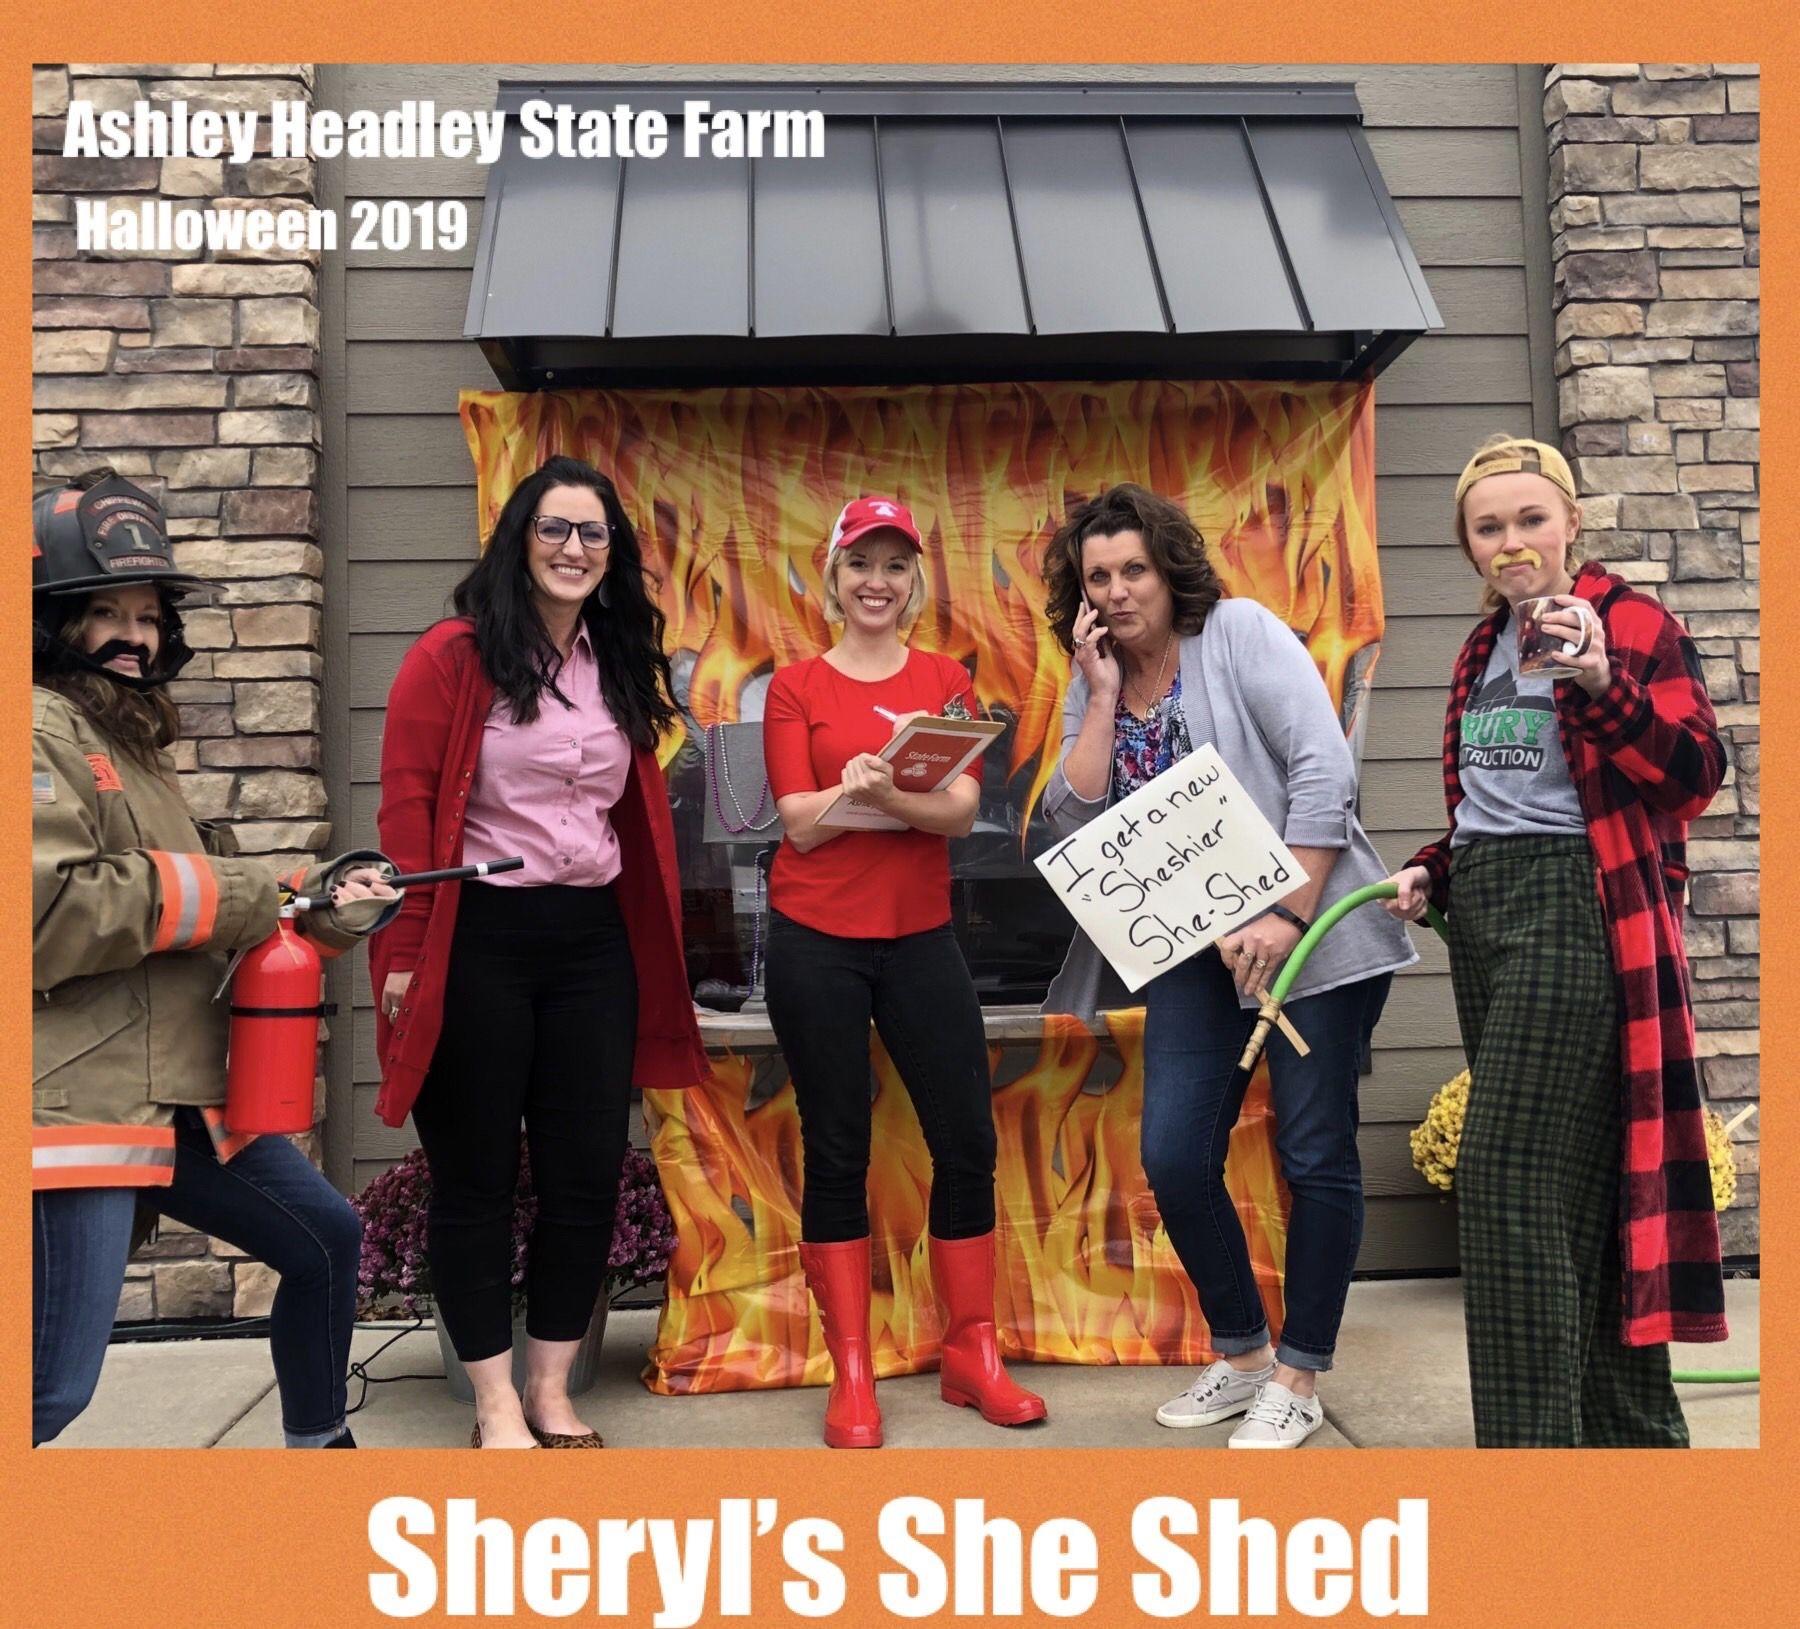 Sheryl's She Shed Ashley Headley State Farm  #SheShed #AHSF #StateFarm